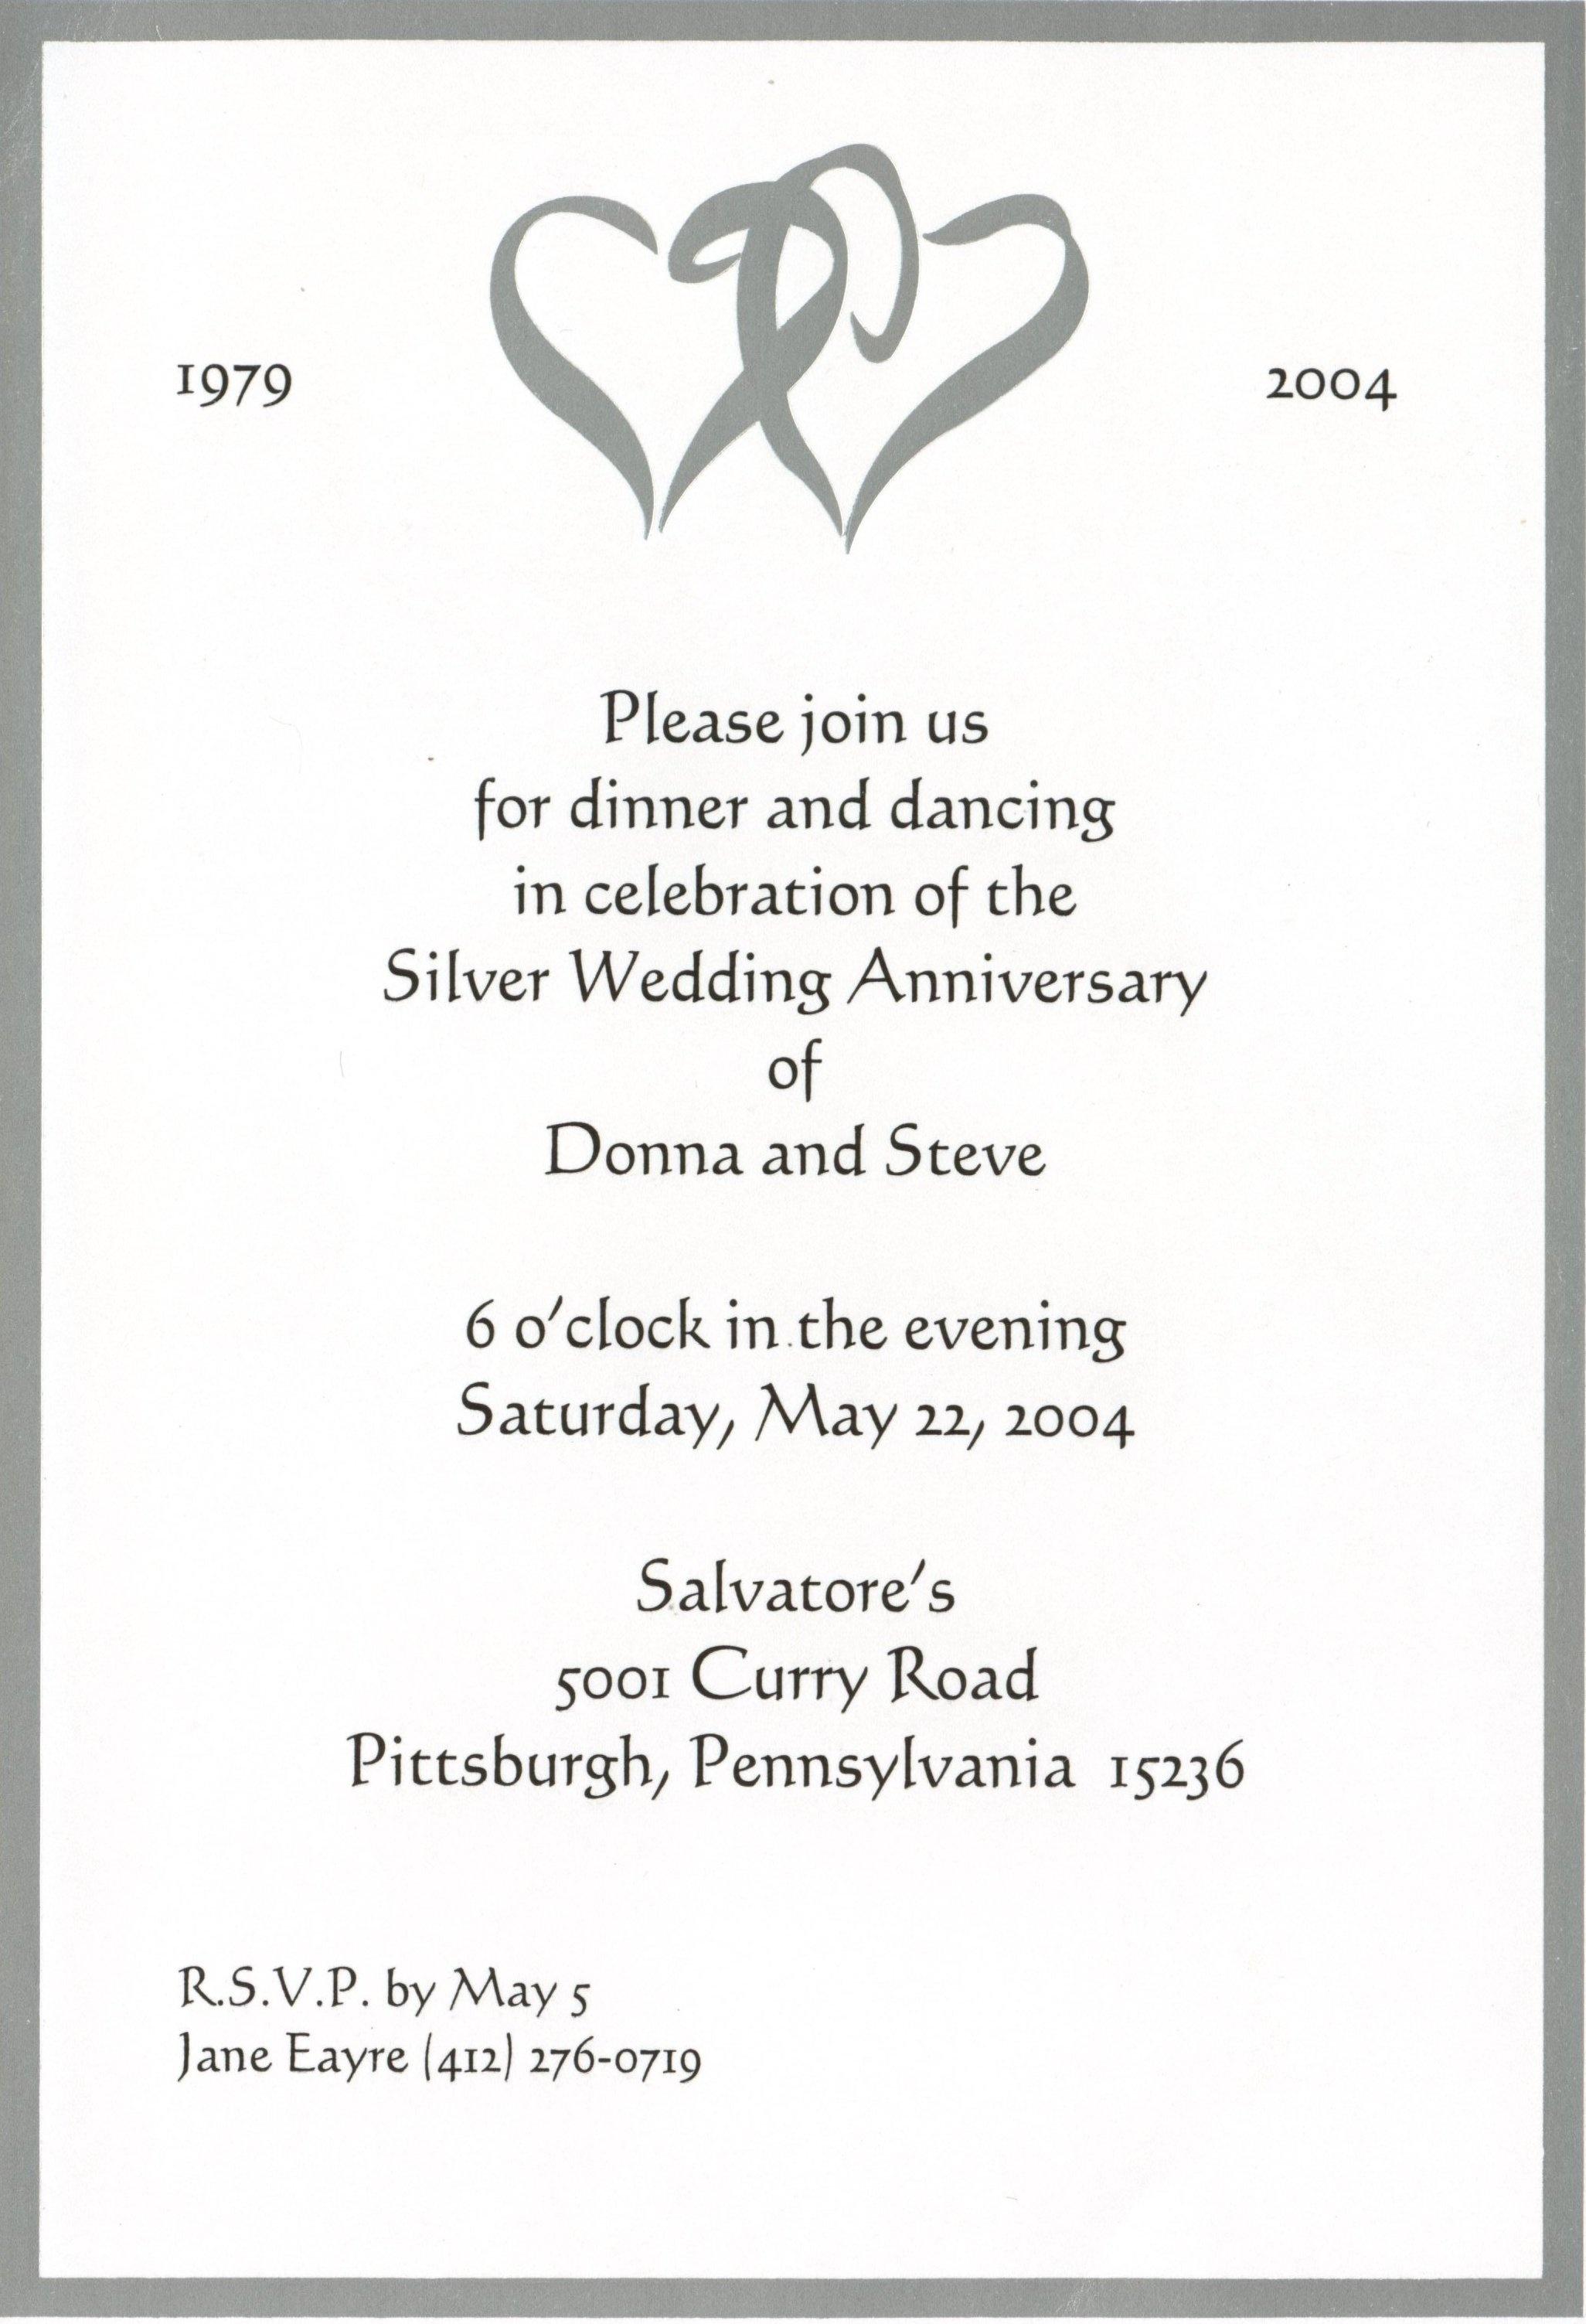 Free Anniversary Invitation Cliparts, Download Free Clip Art, Free - Free Printable 60Th Wedding Anniversary Invitations